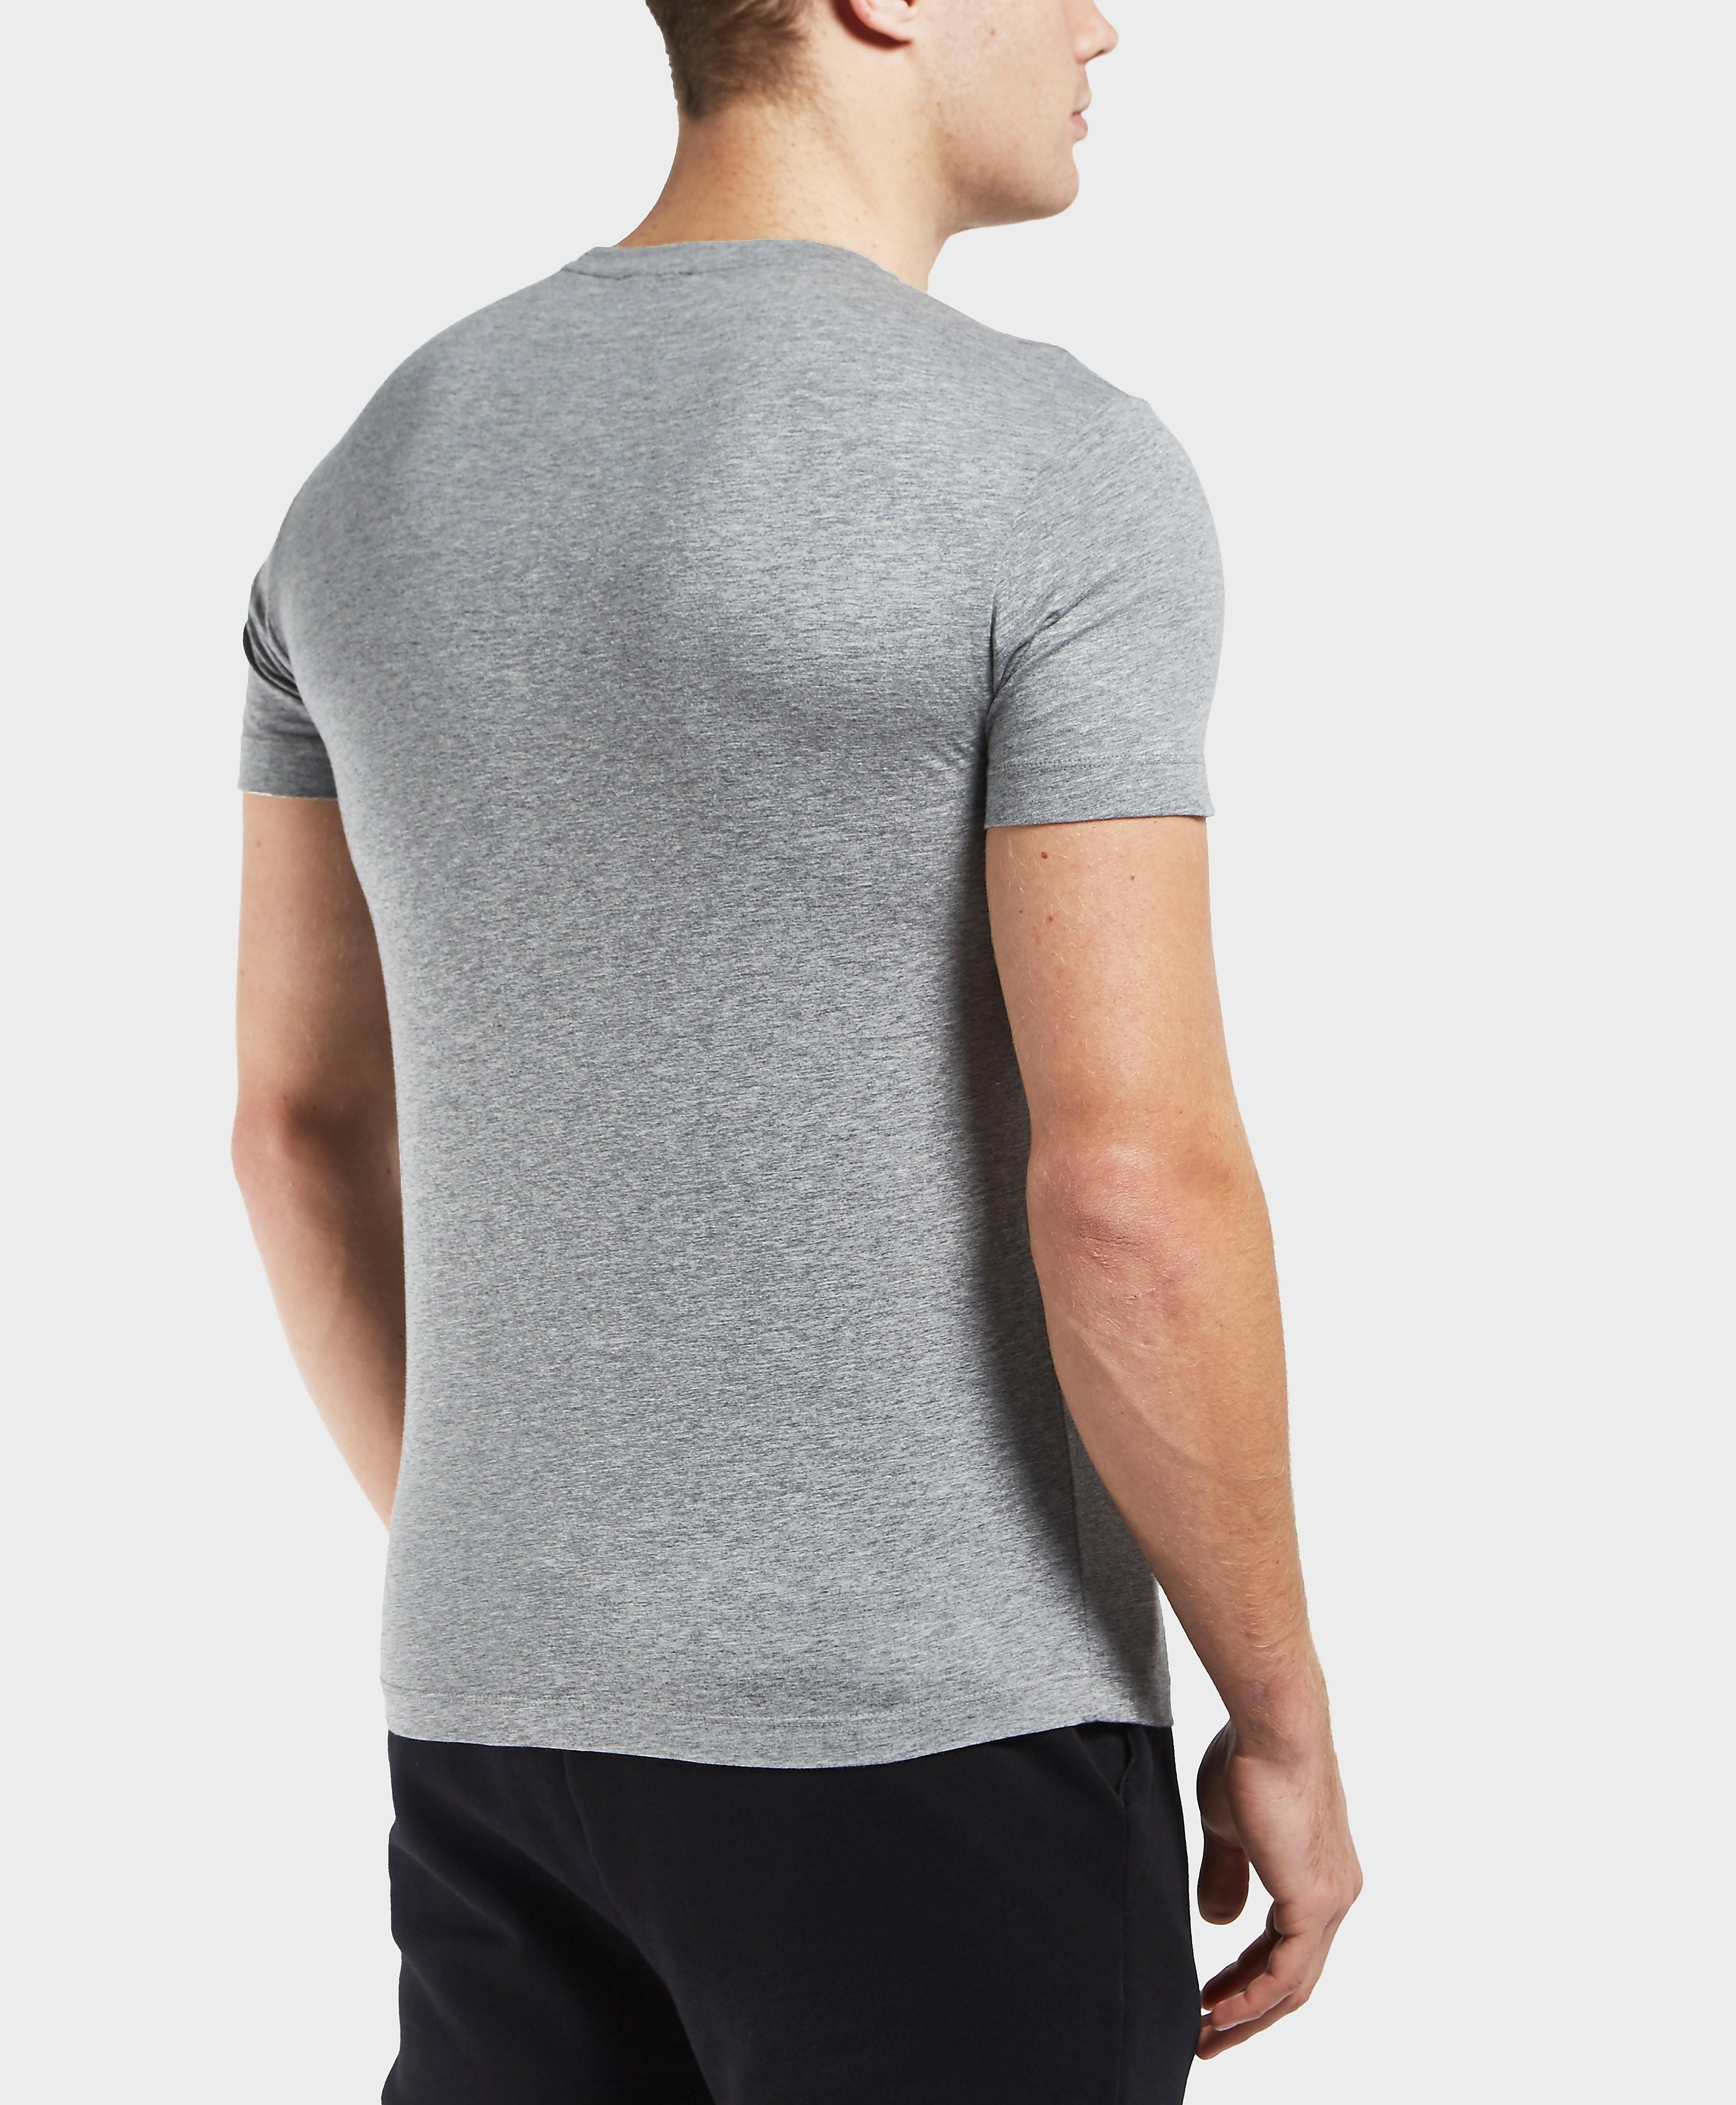 Emporio Armani EA7 Logo Series Short Sleeve T-Shirt